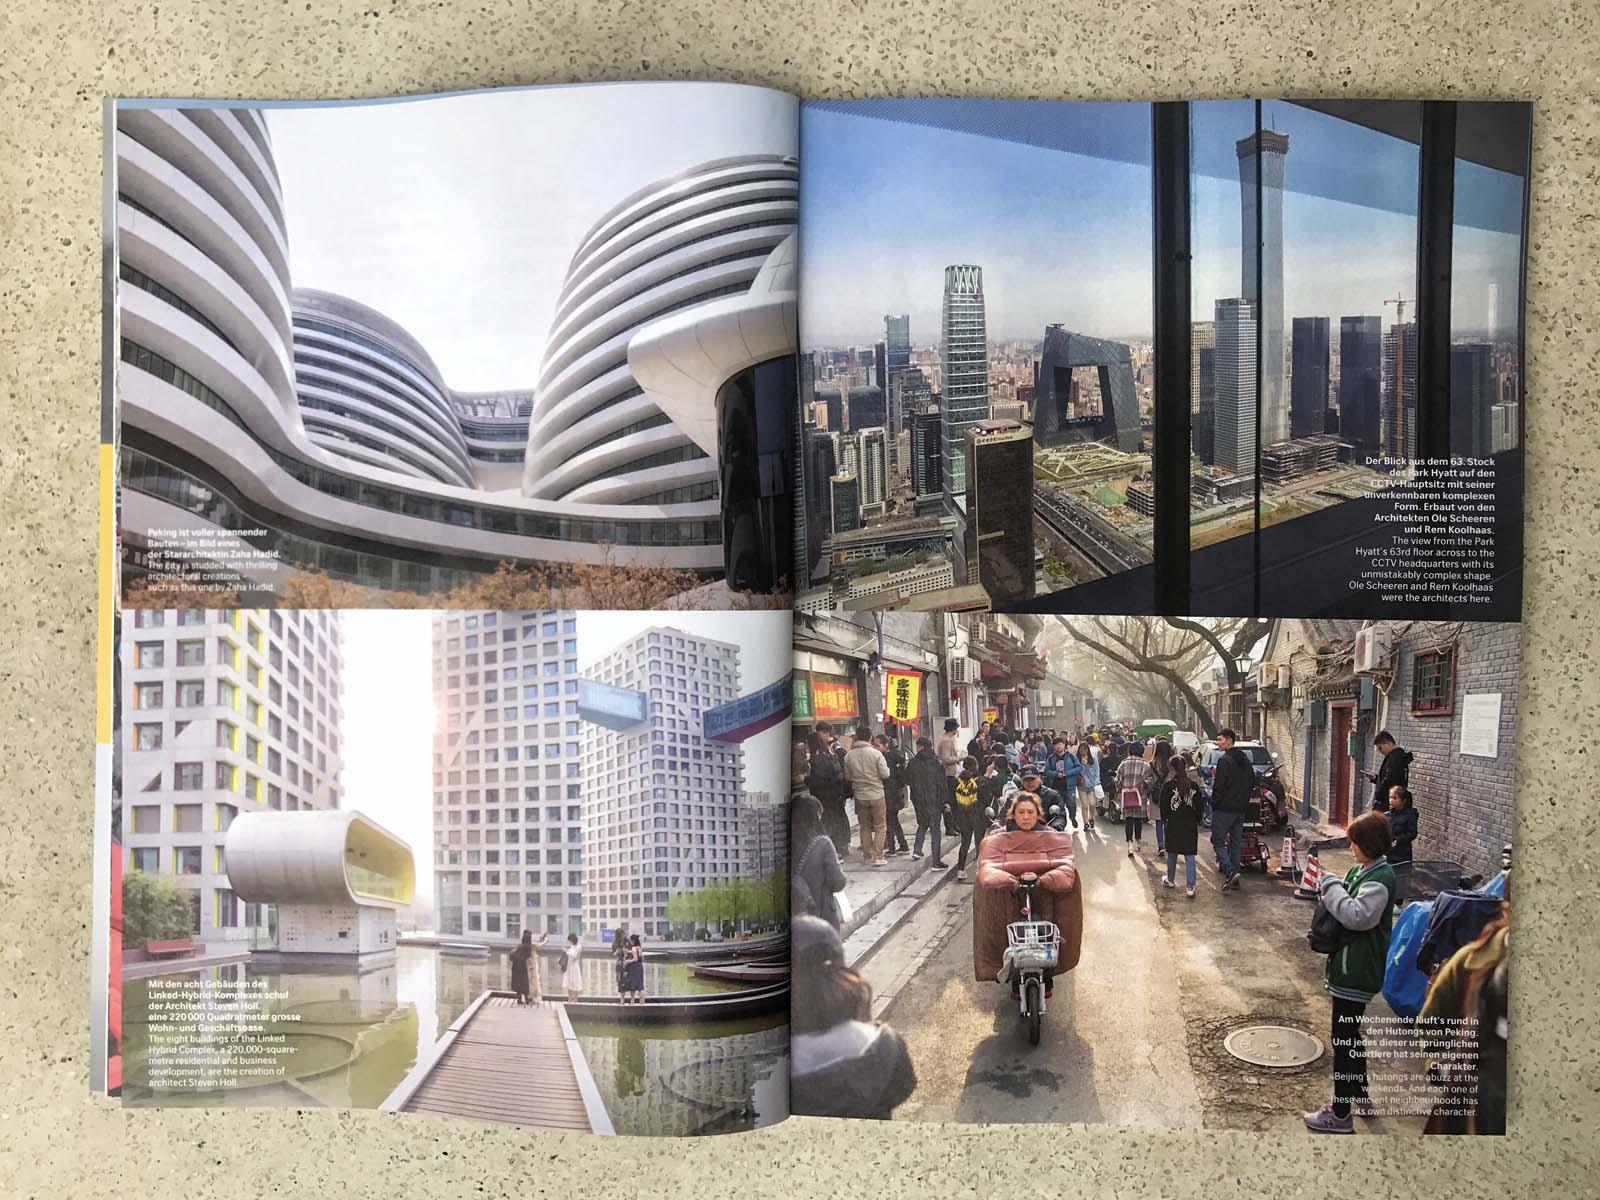 Swiss Magazine Peking 07 | nuvu